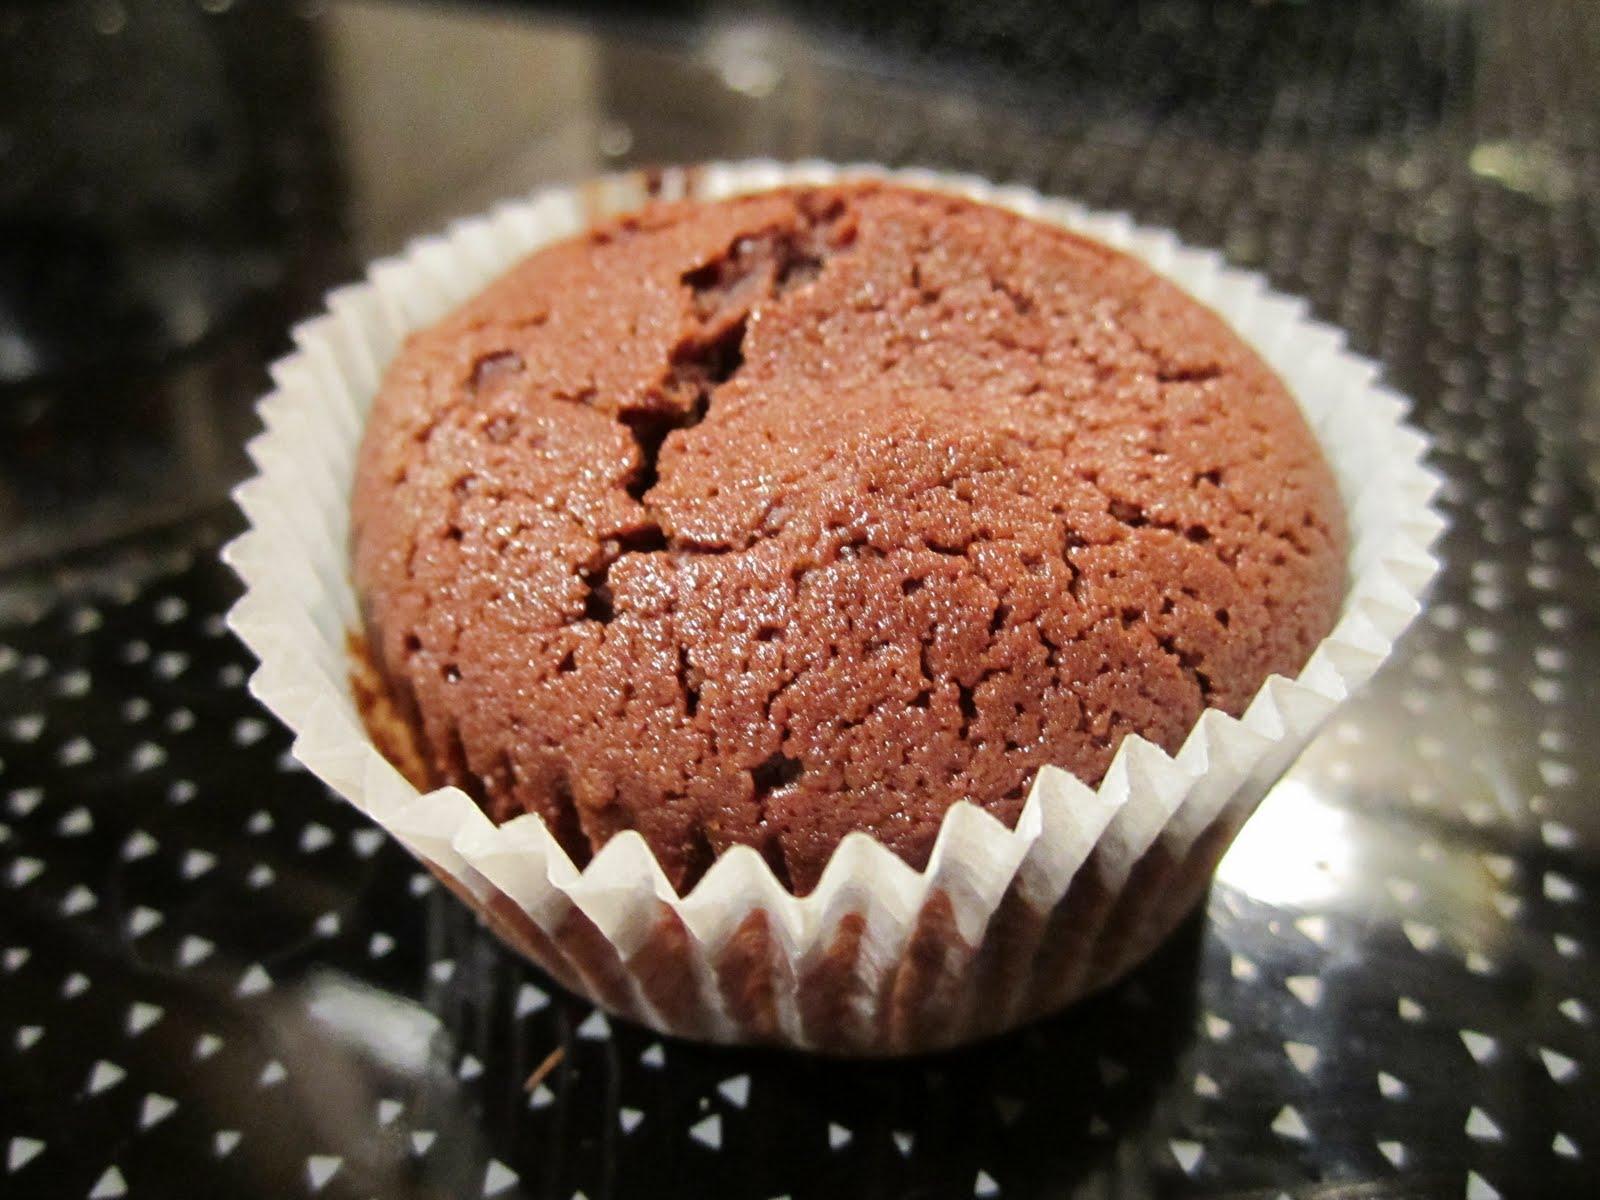 enkle sjokolademuffins